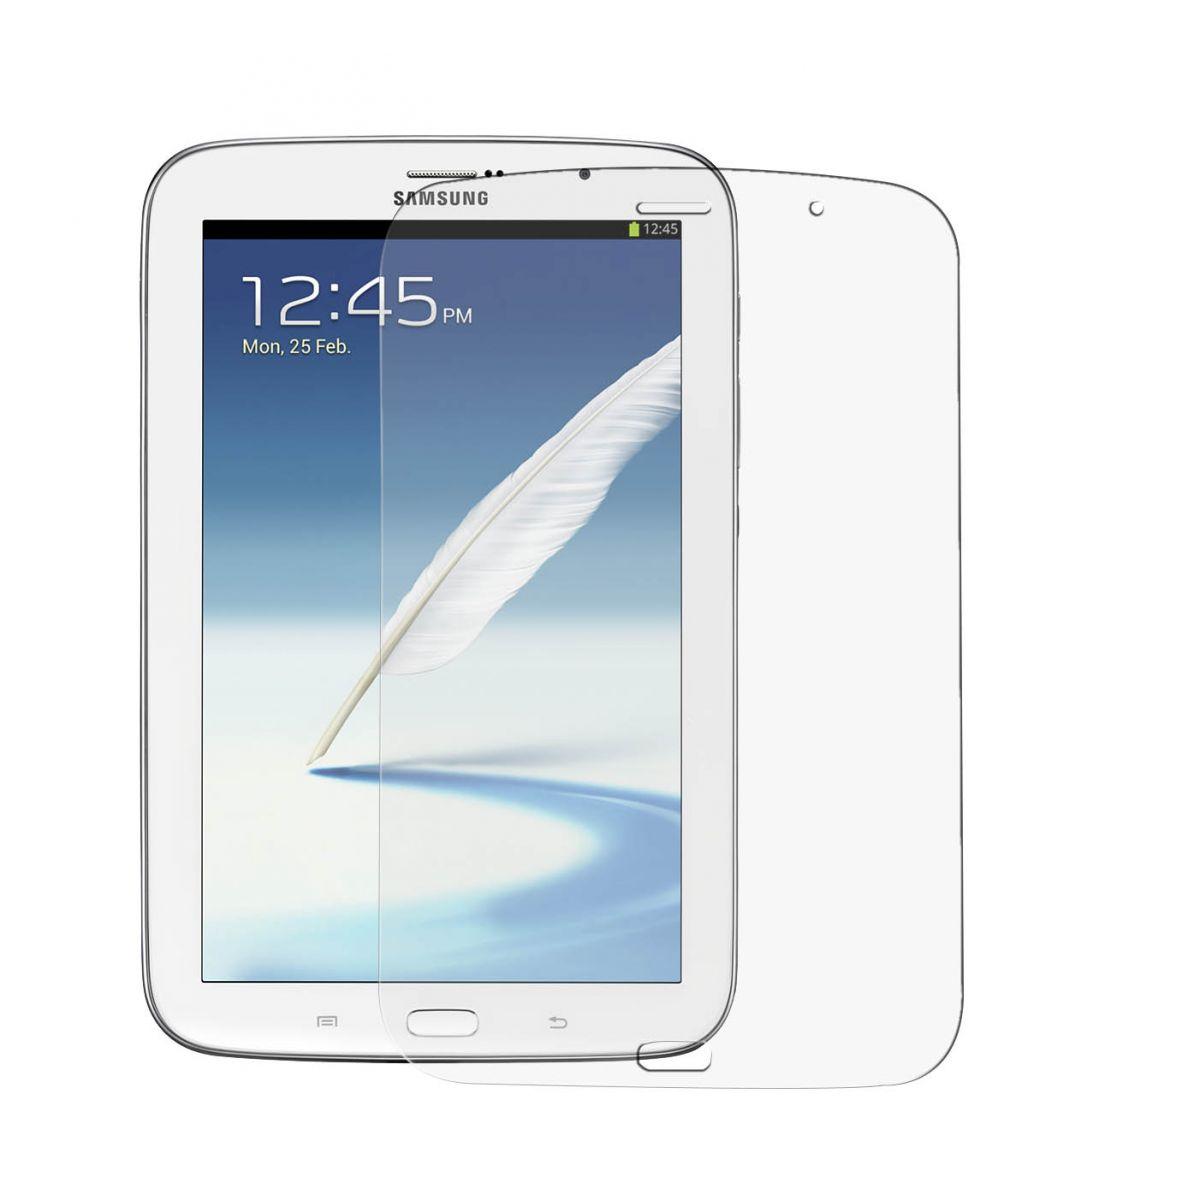 Pelicula protetora para Samsung Galaxy Note 8.0 GT-N5100 N5110 Fosca